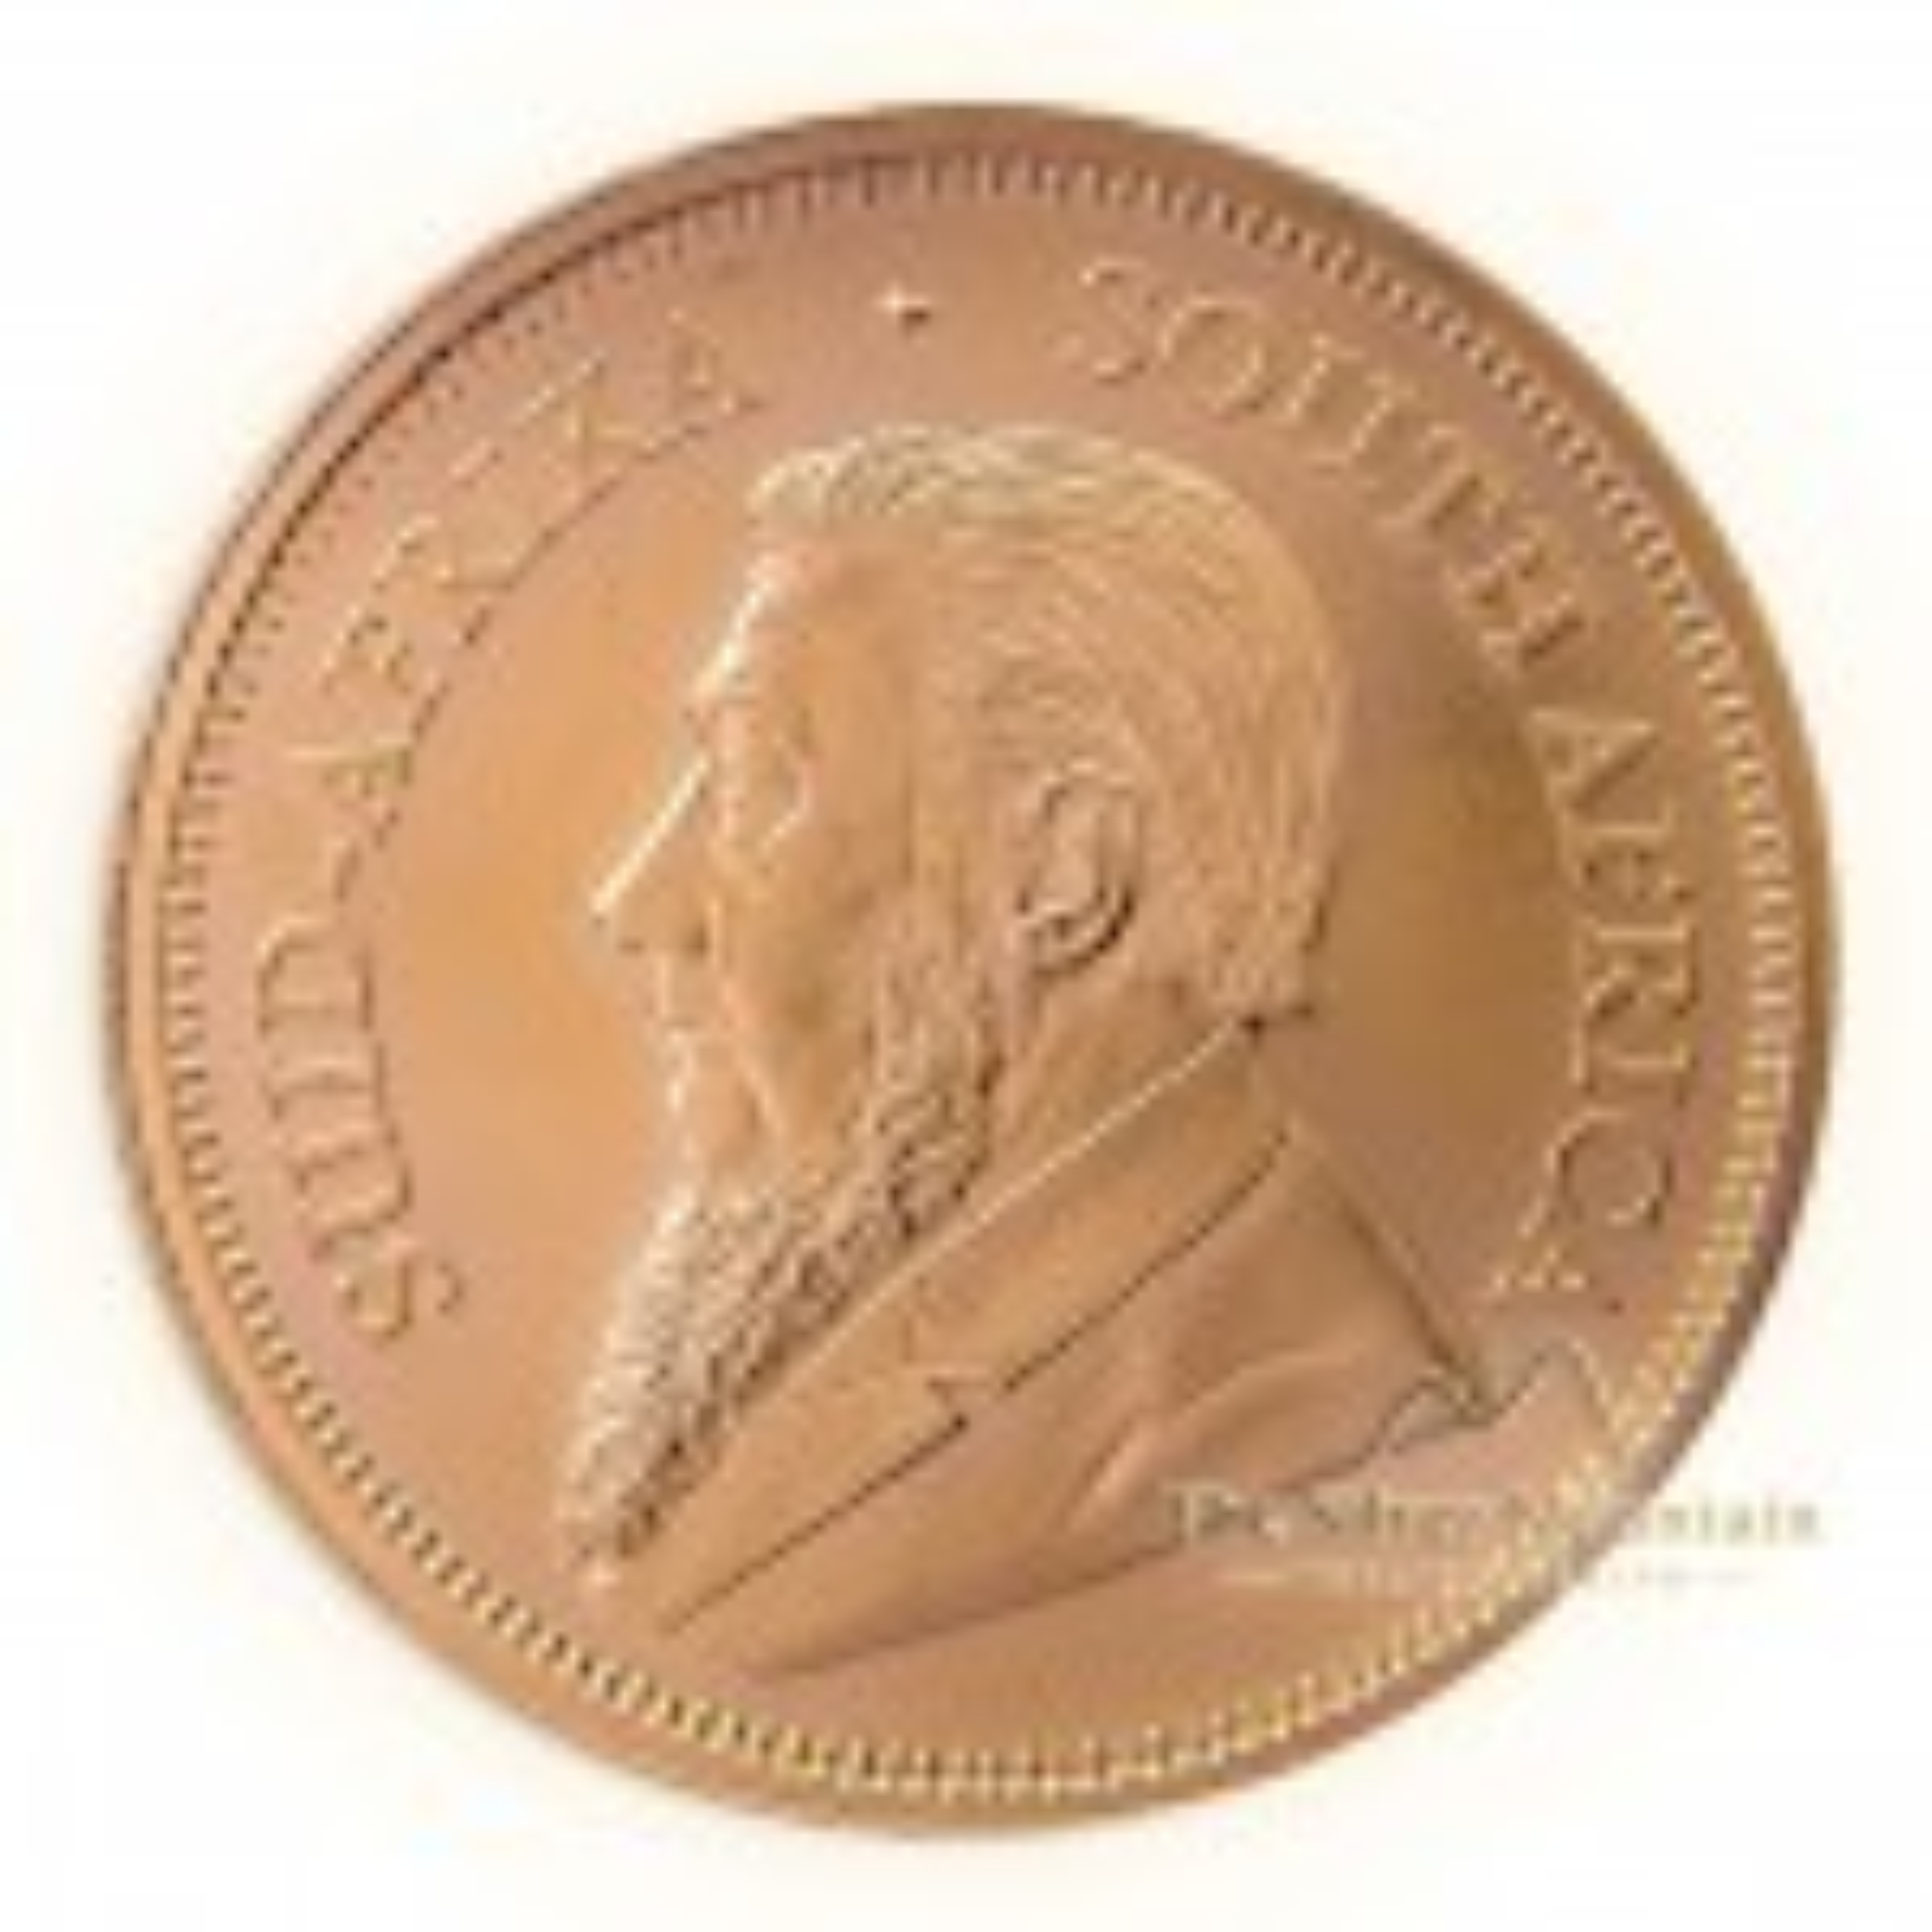 1 troy ounce gold Krugerrand coin 2020